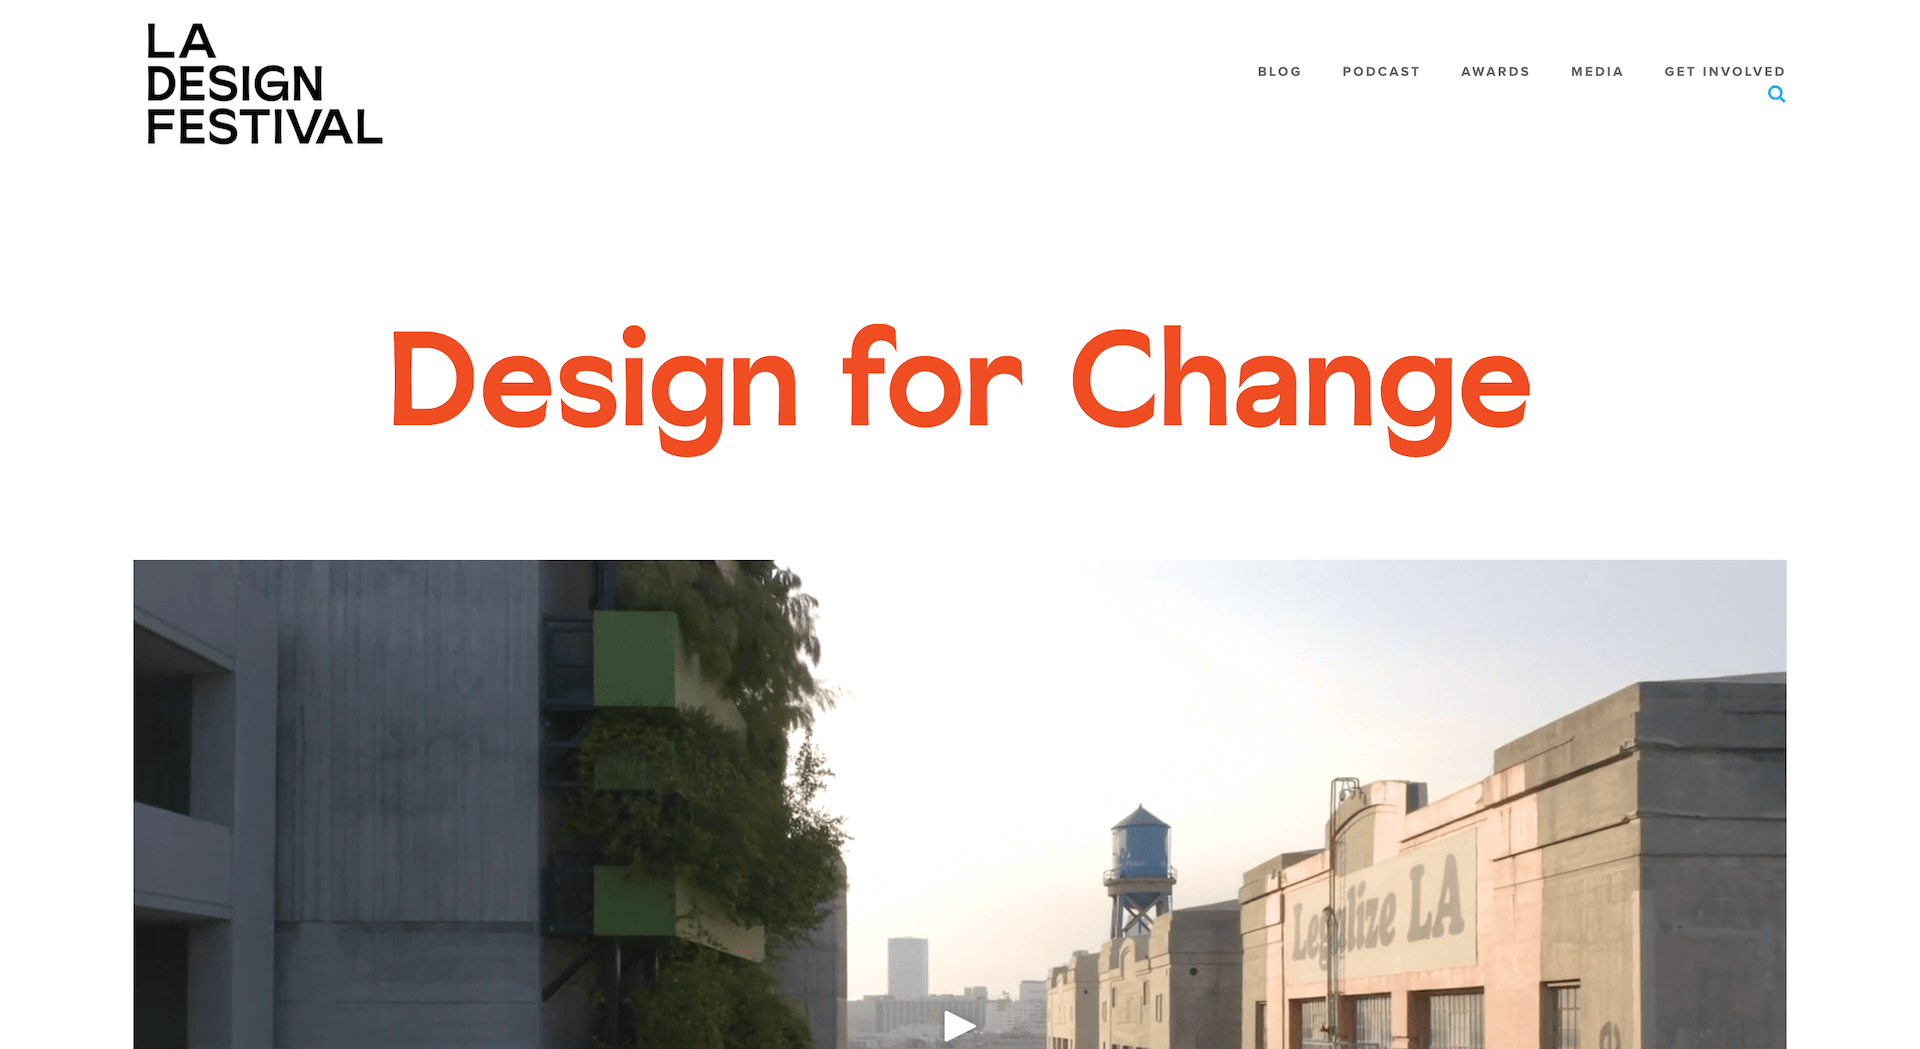 LA Design Festival: Best Interior Design Shows and Events